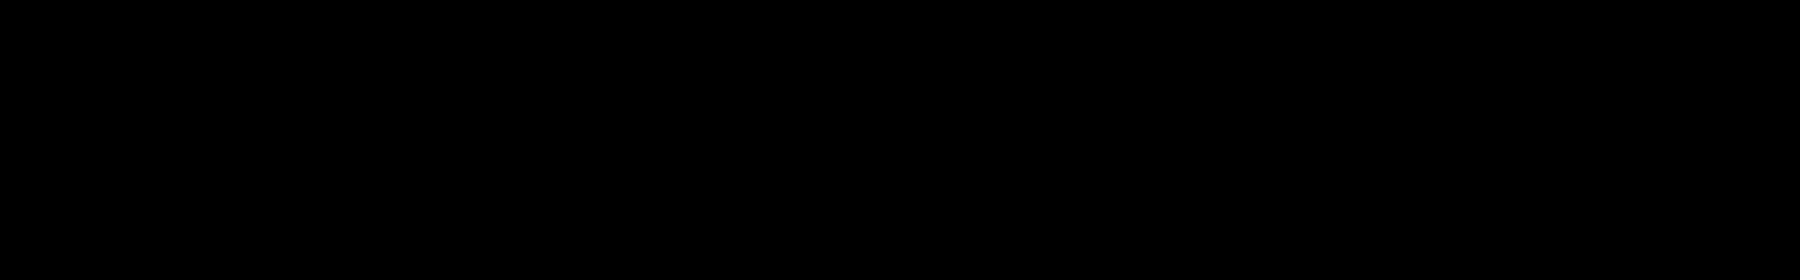 Subhertz 3 - Deep & Dark Dubstep audio waveform